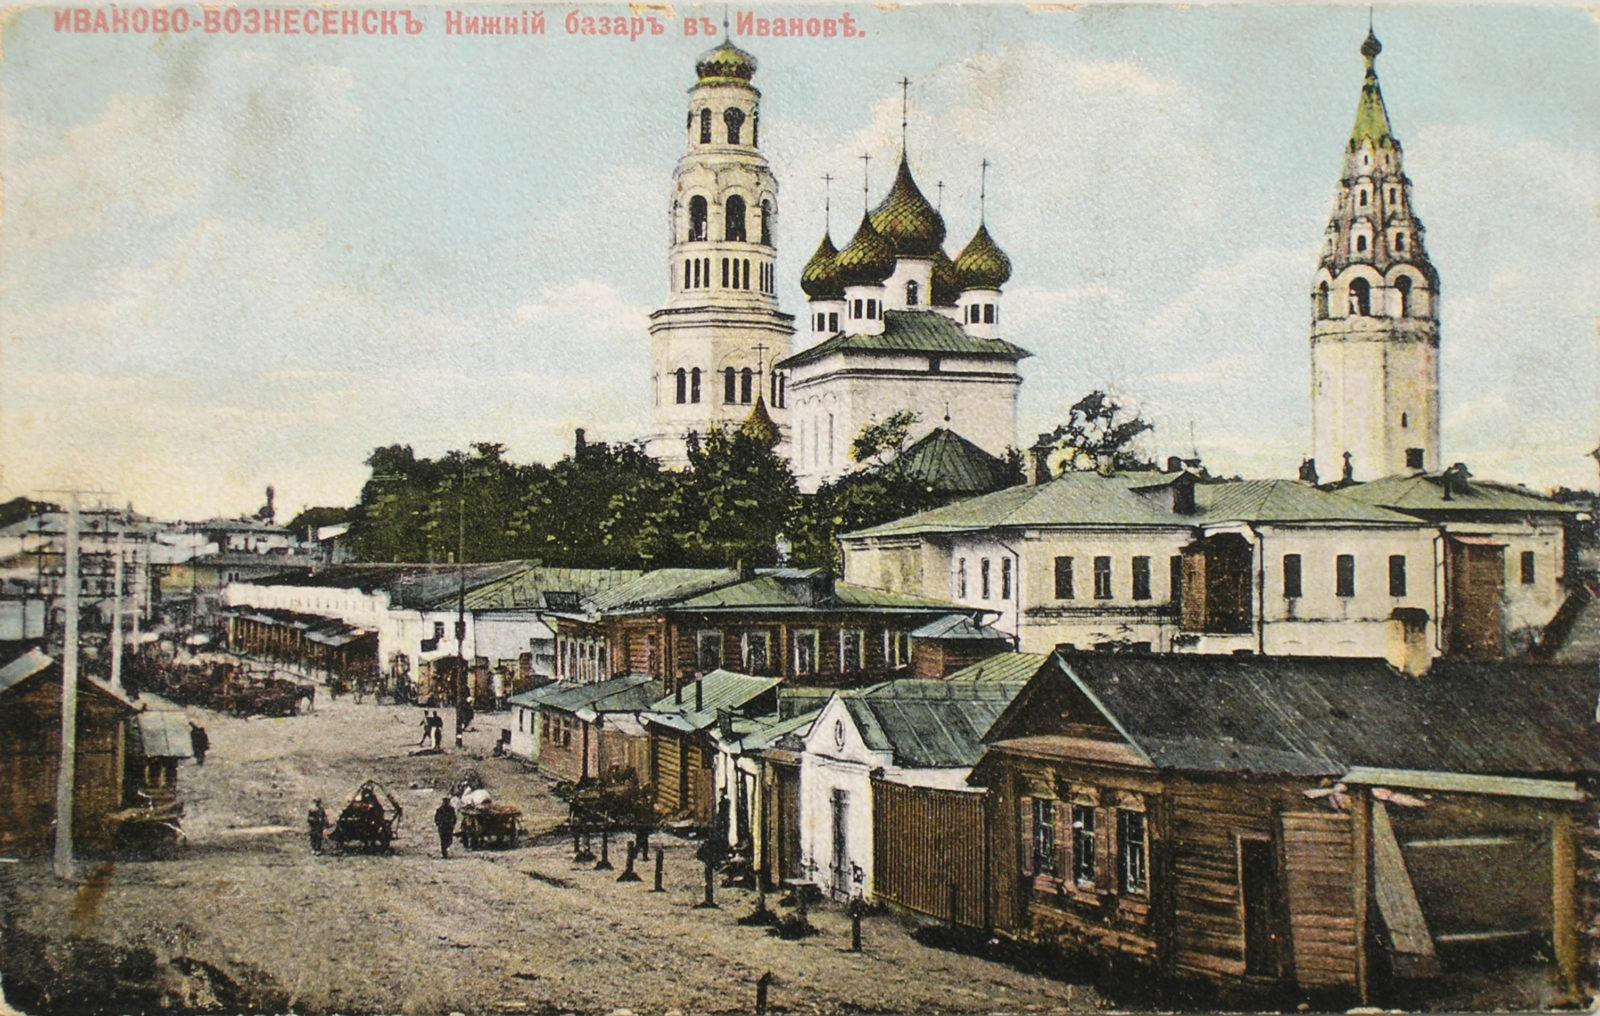 Ivanovo, Lower Marketplace - Textile Center of Russian Empire